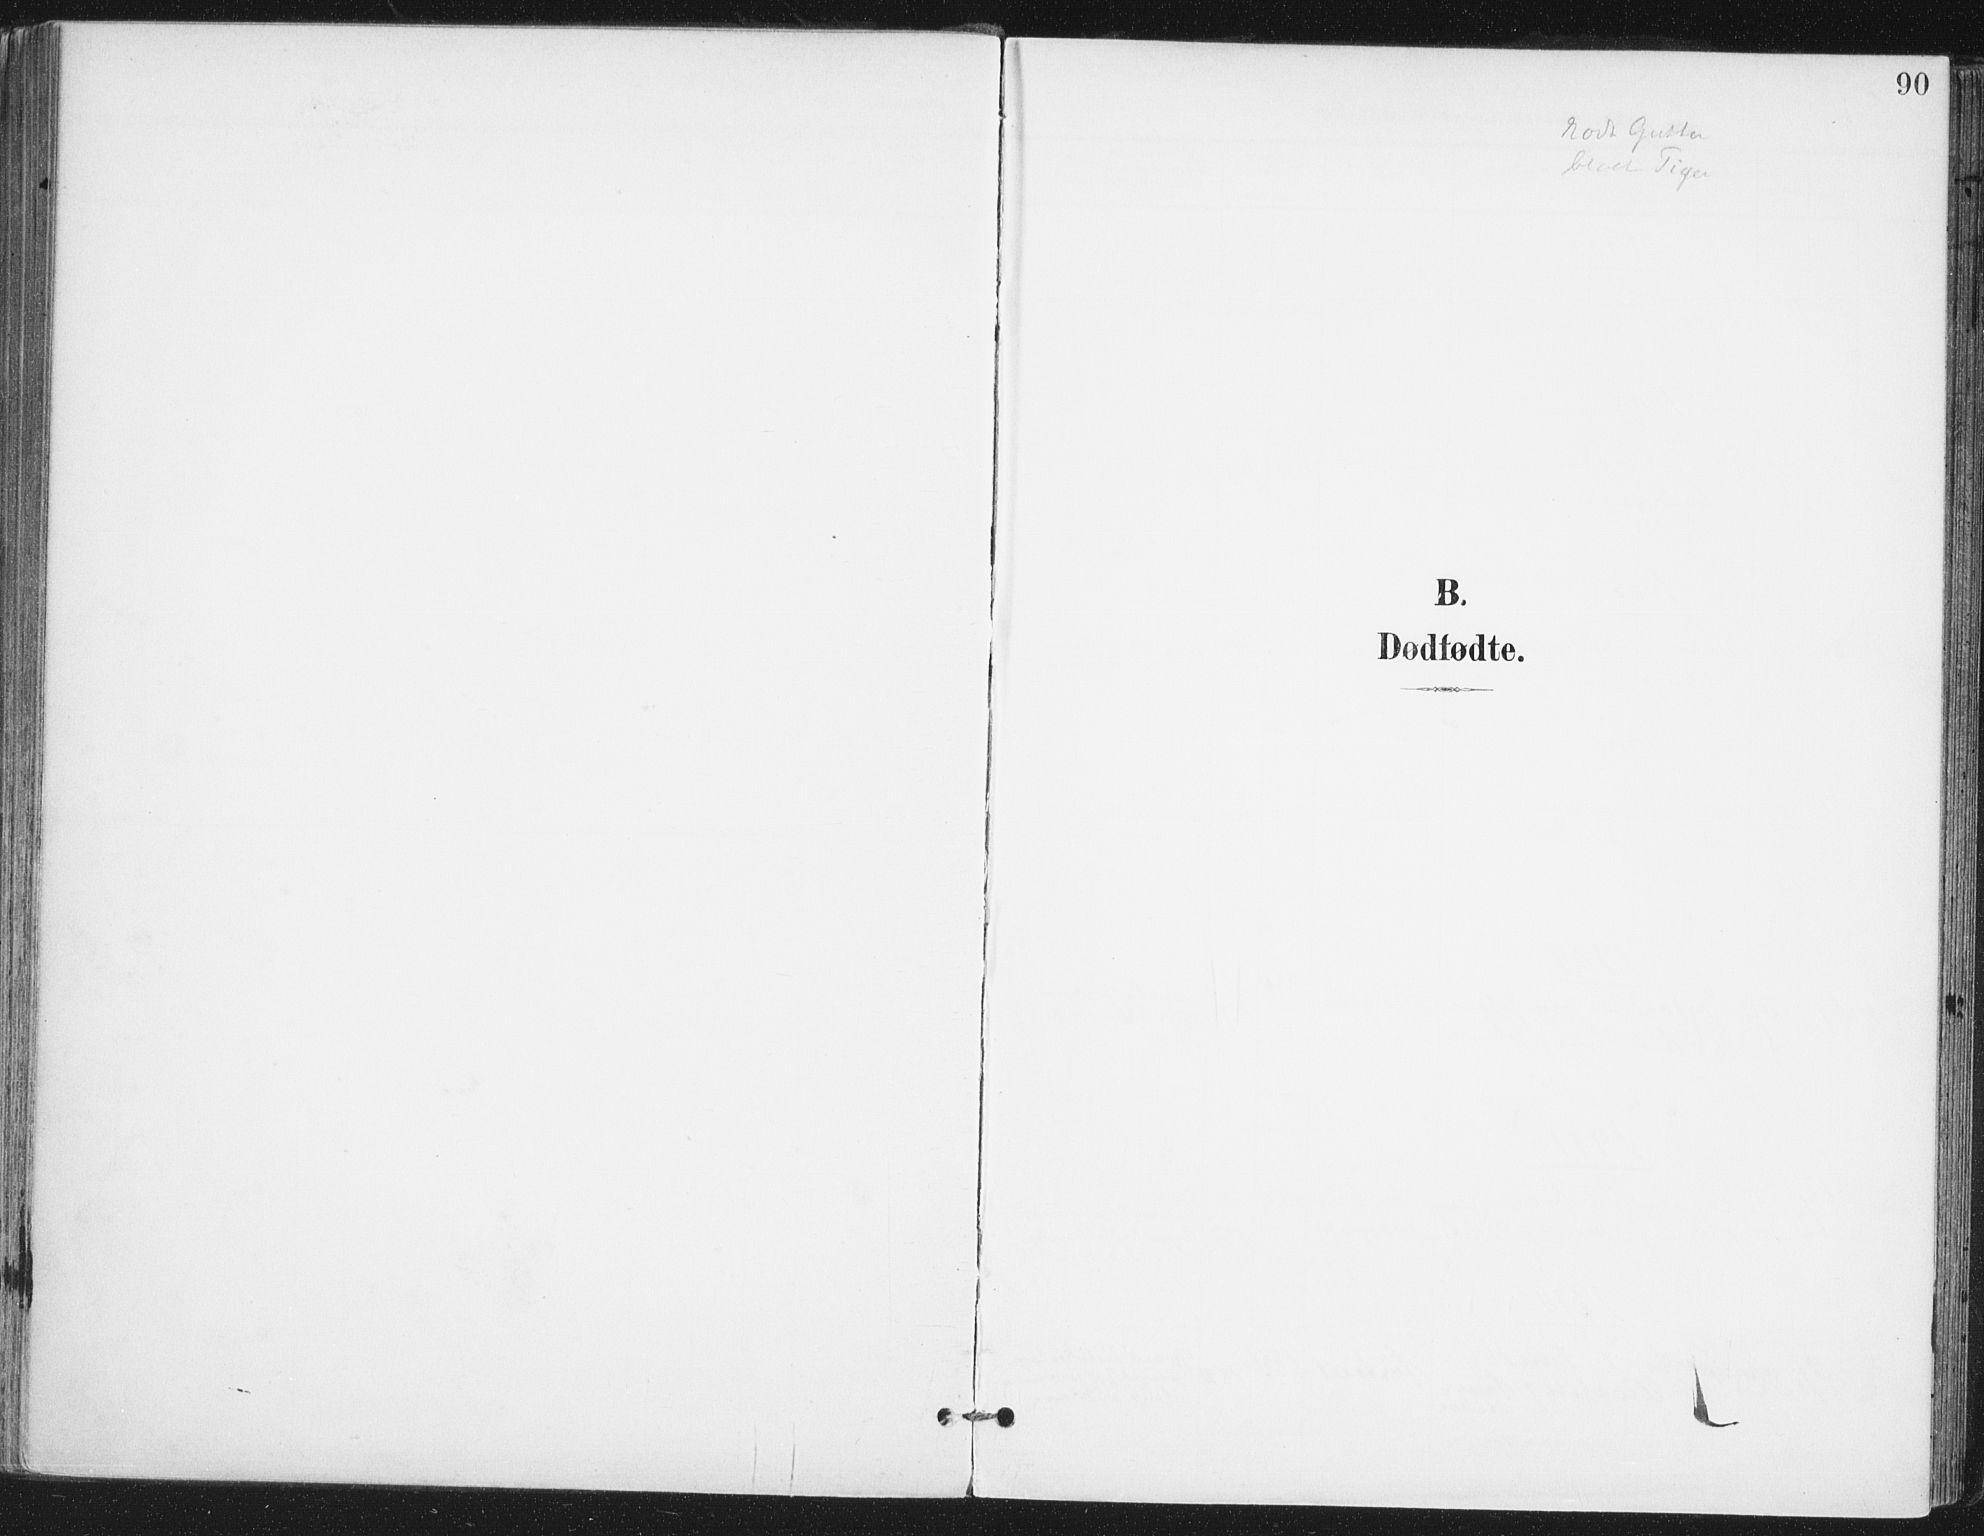 SAO, Ås prestekontor Kirkebøker, F/Fa/L0010: Ministerialbok nr. I 10, 1900-1918, s. 90